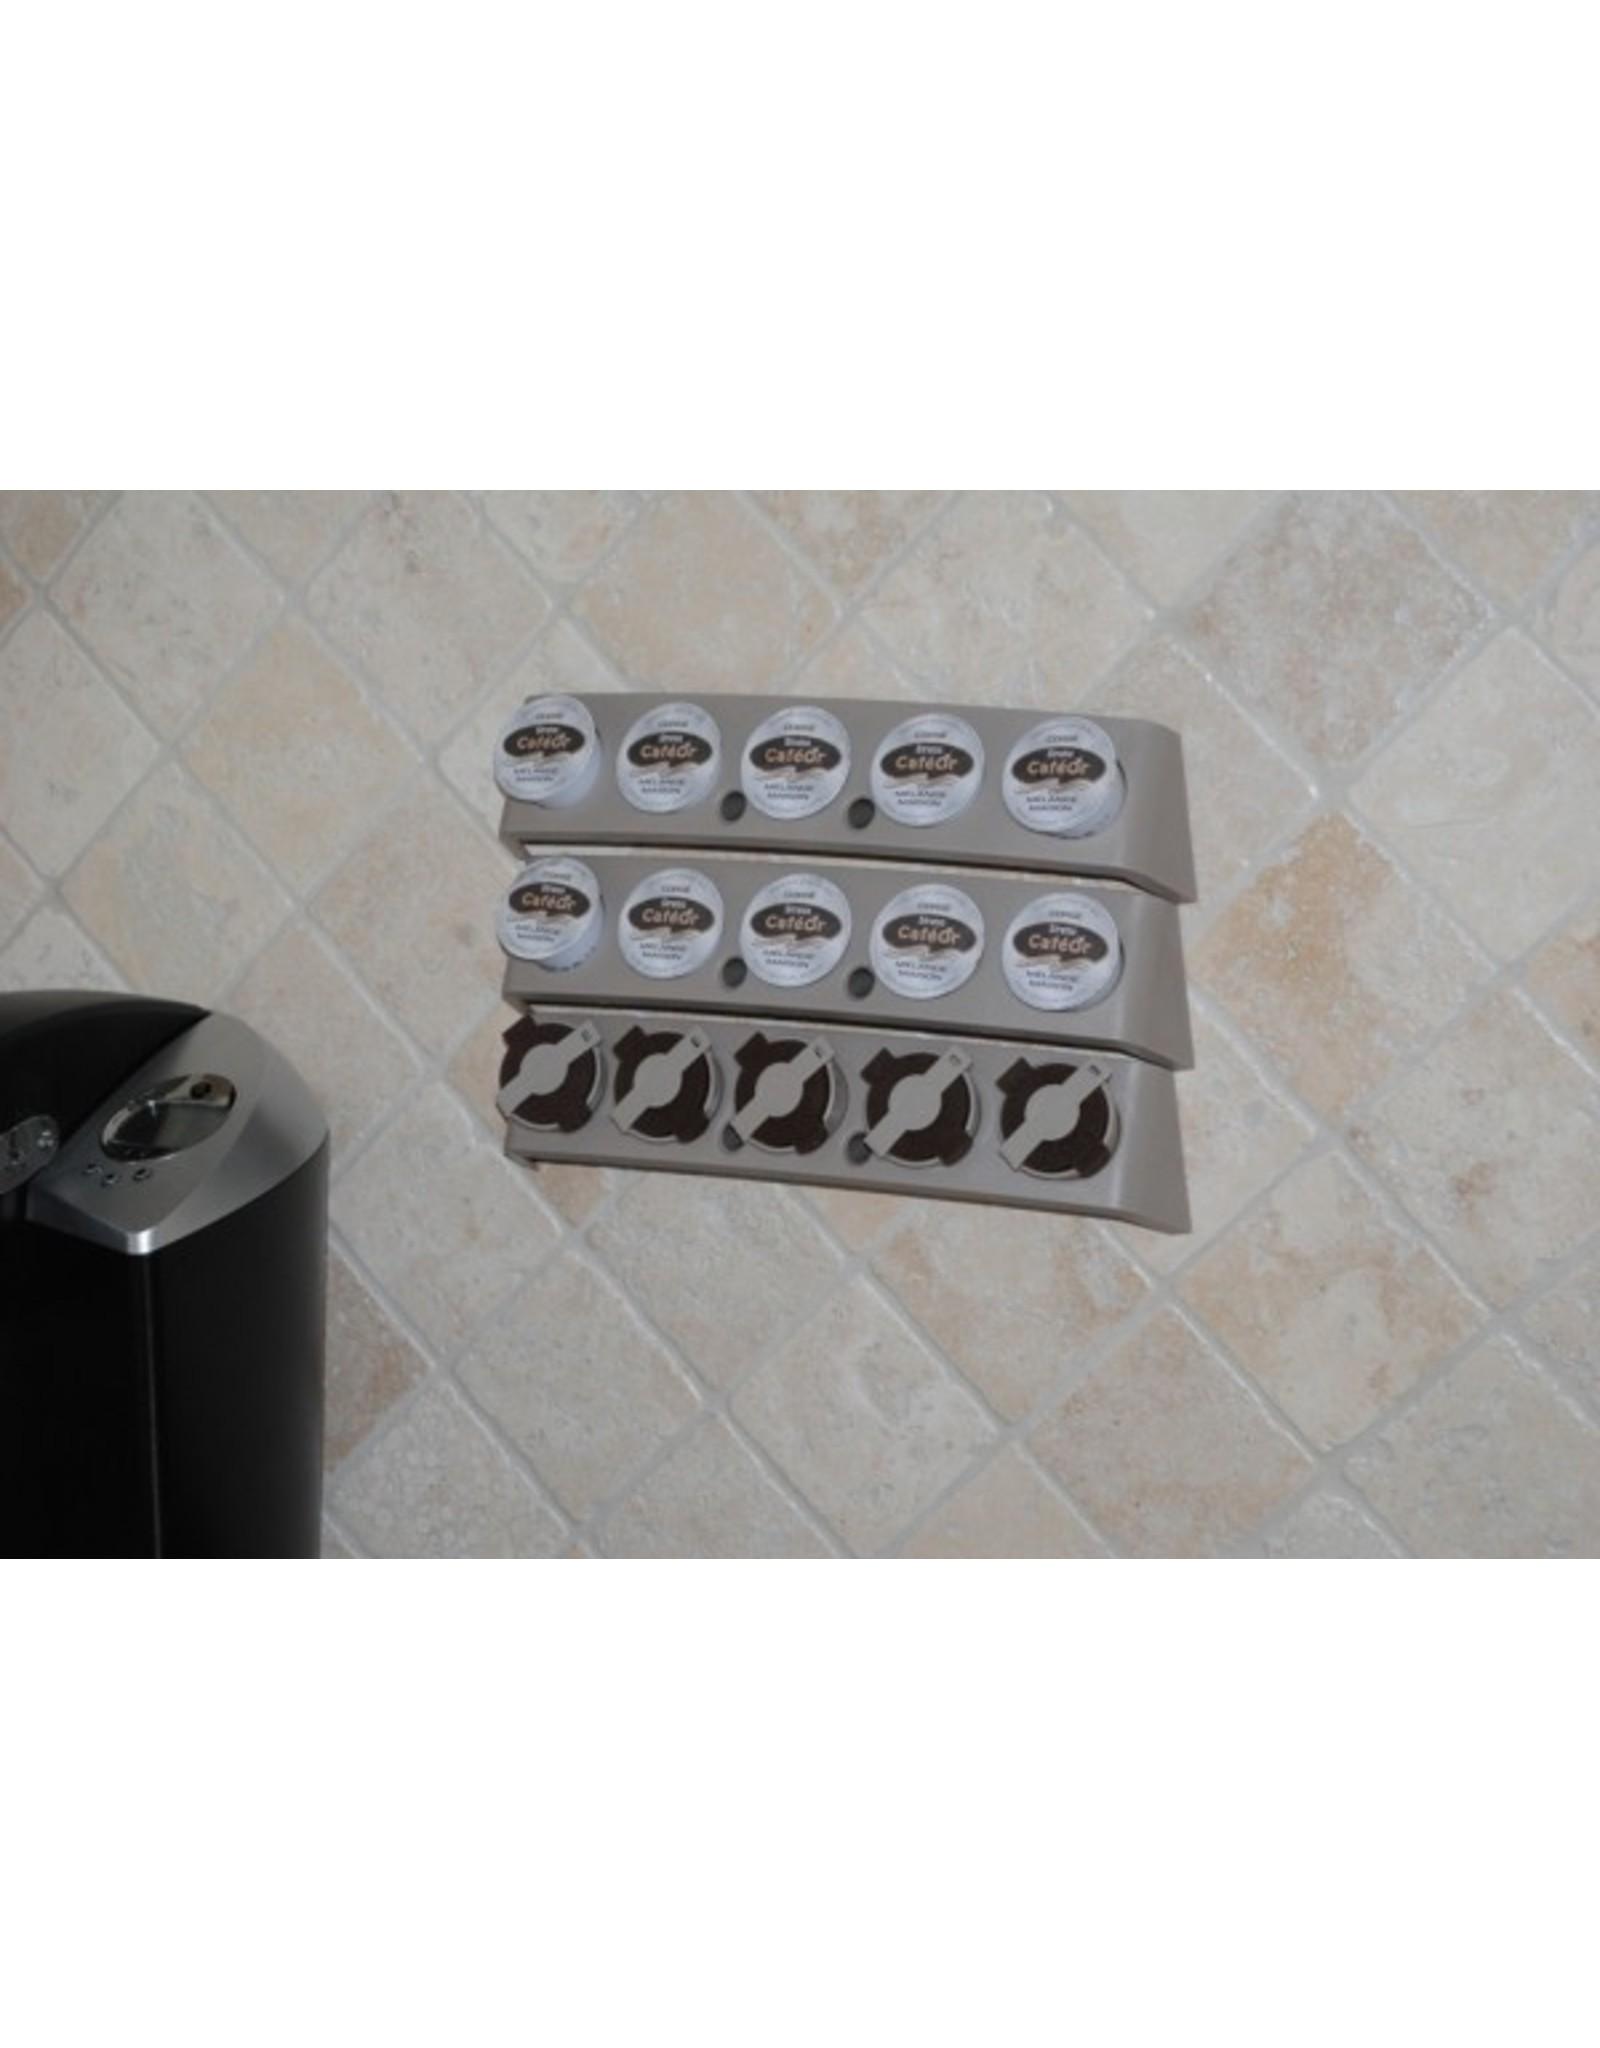 EZ WAY RACK FOR POD FILTER (K-cup compatible)